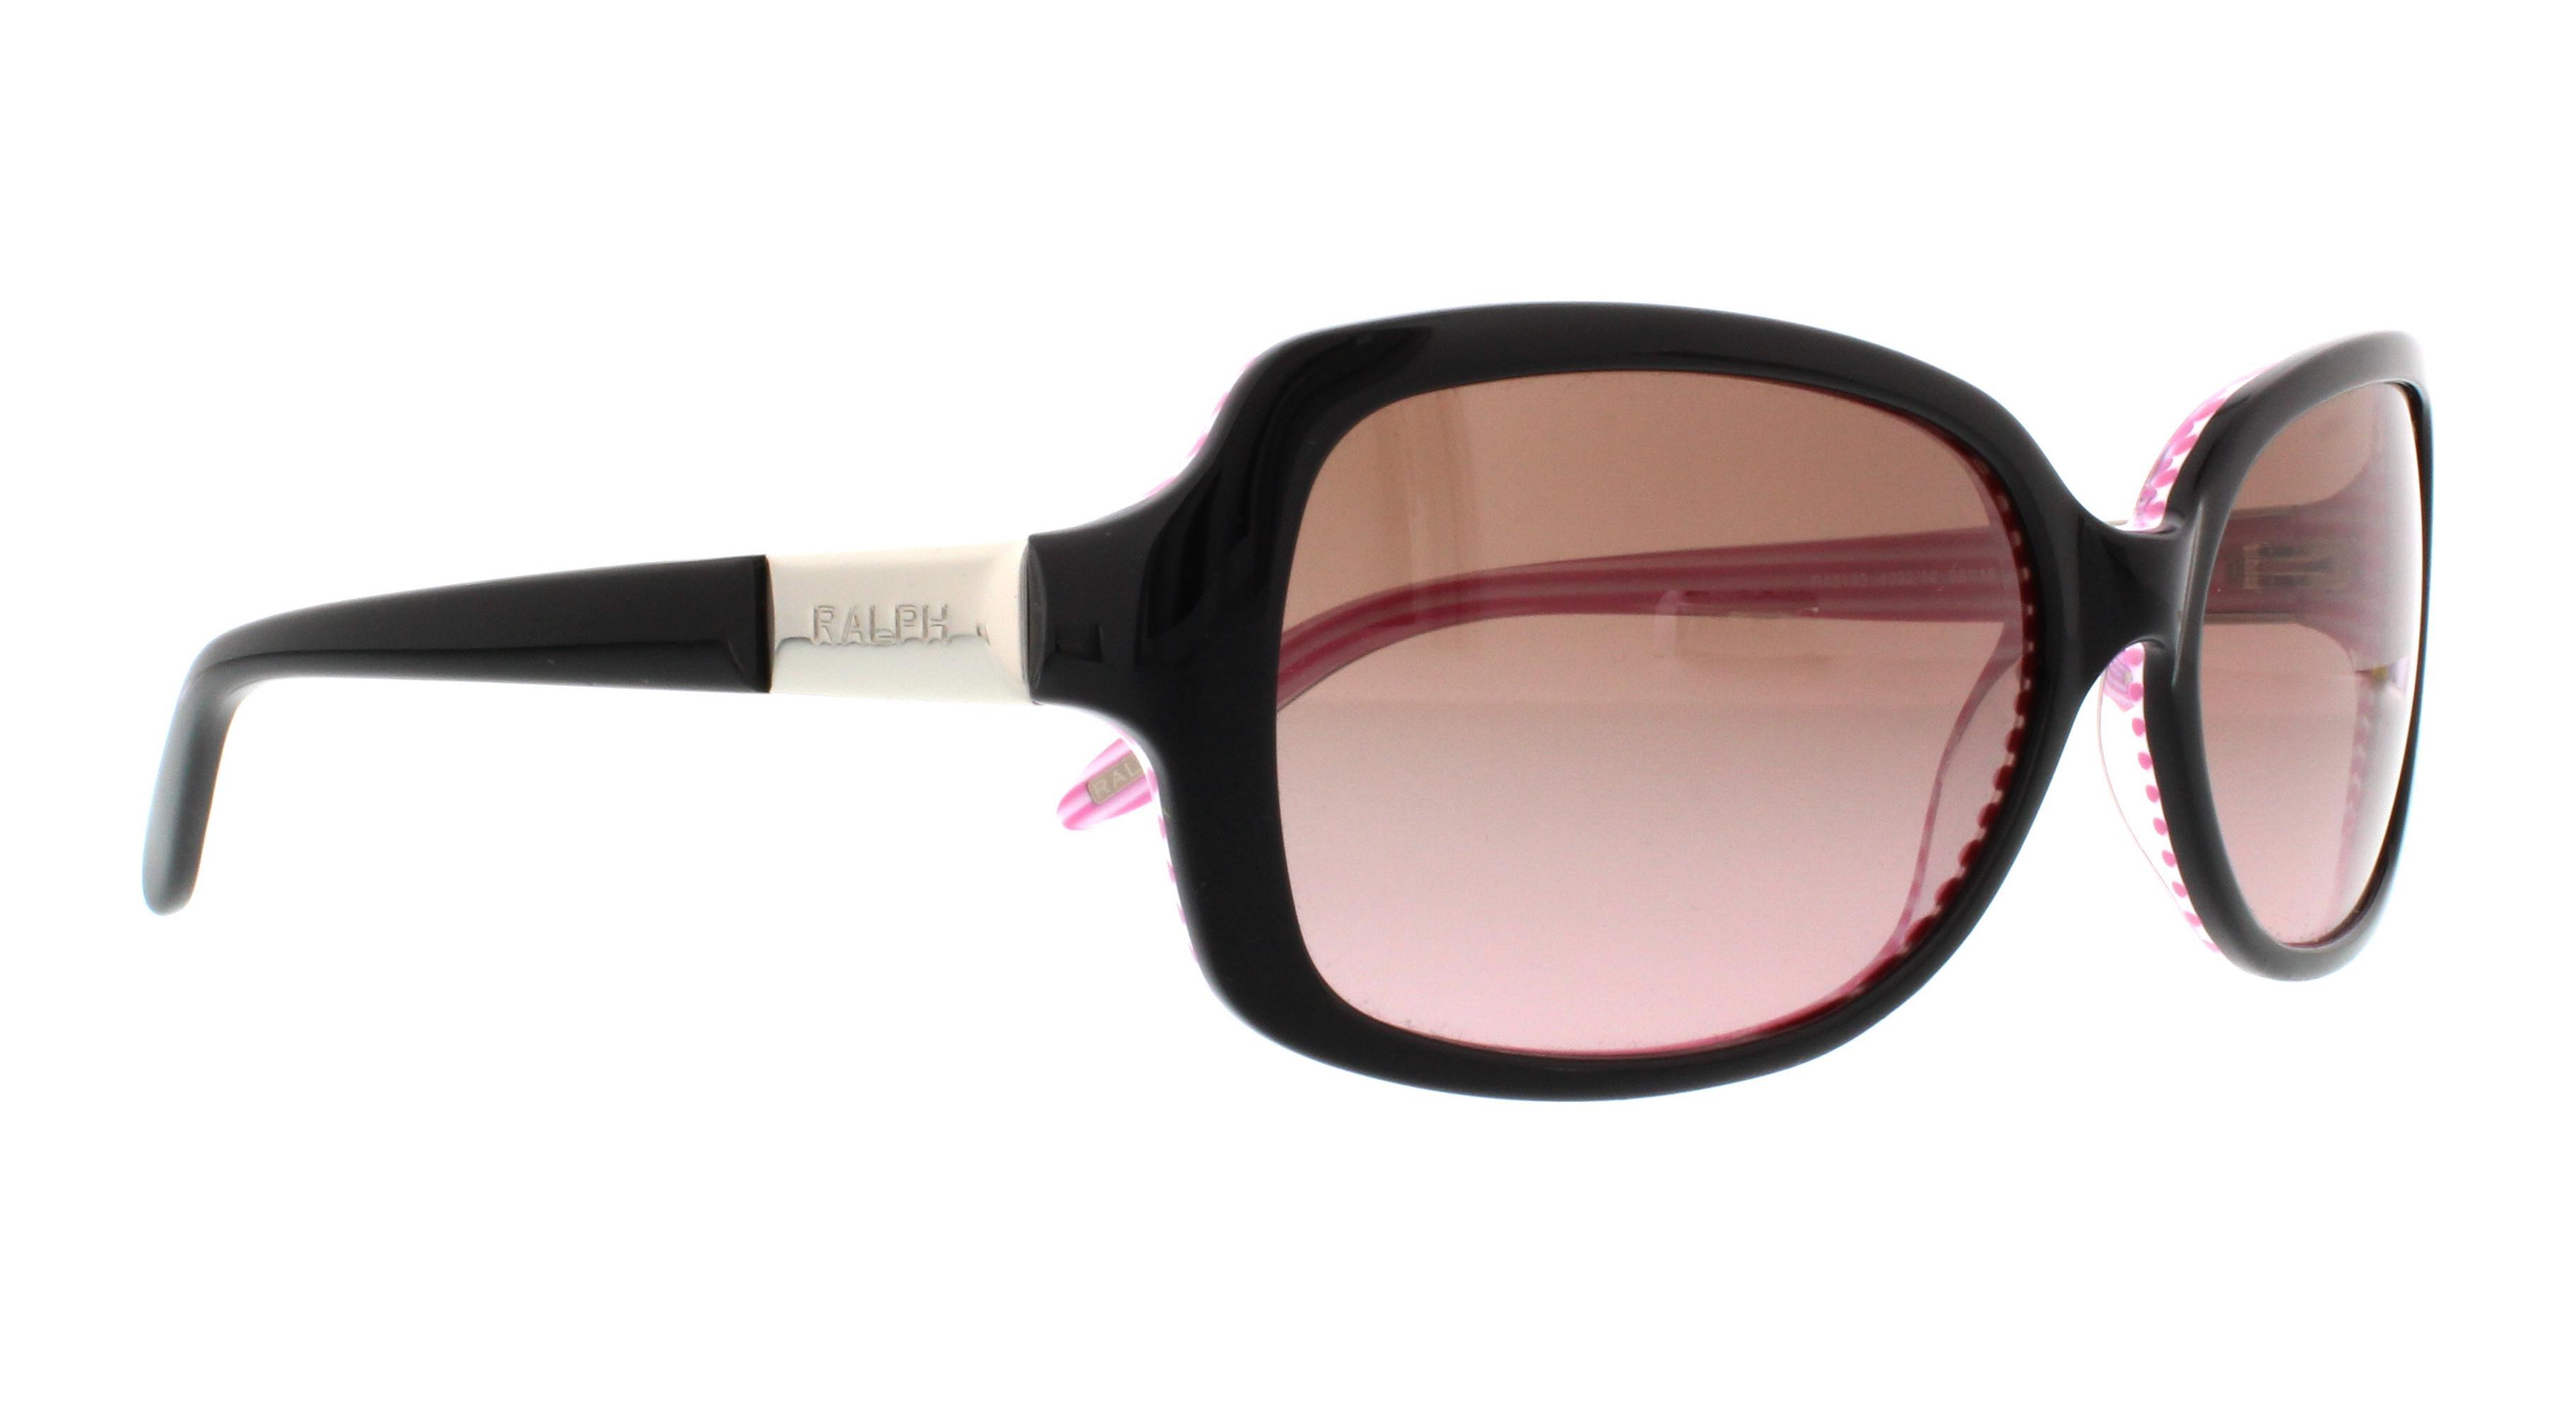 Ralph RA5130 Sonnenbrille Black / Pink 109214 58mm wLrDoa9J